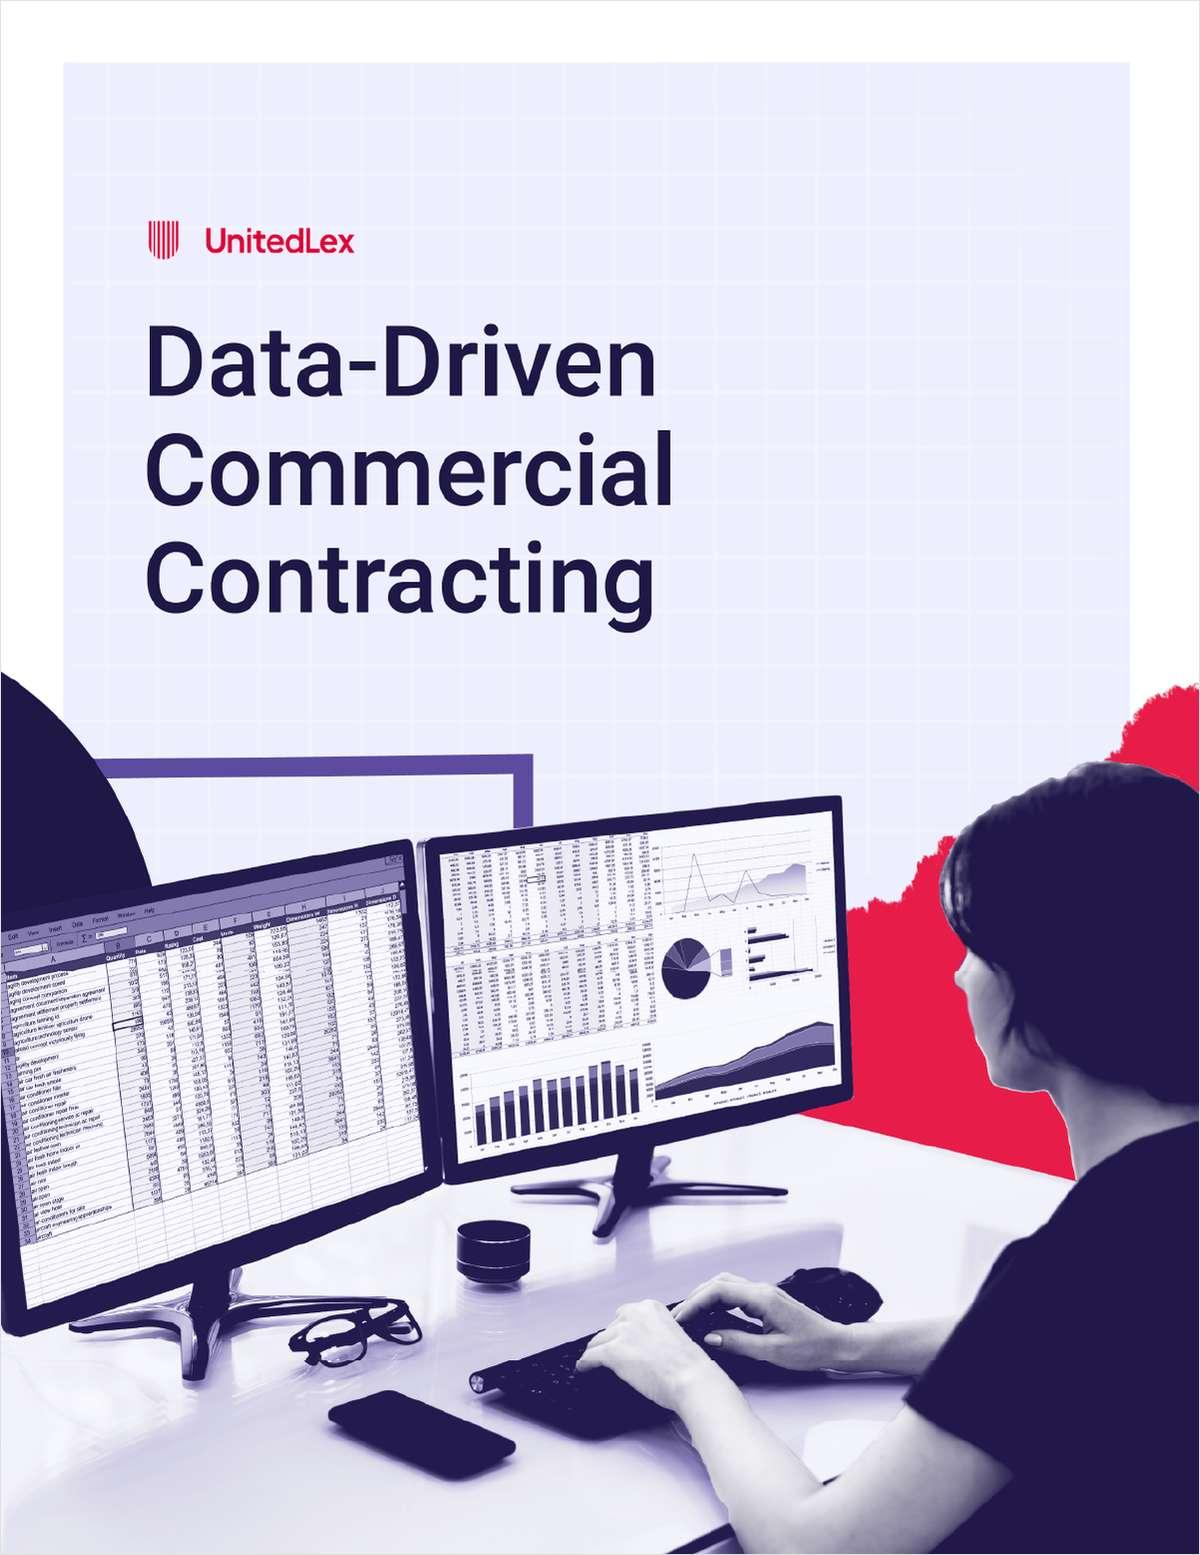 CCS Data-Driven White Paper